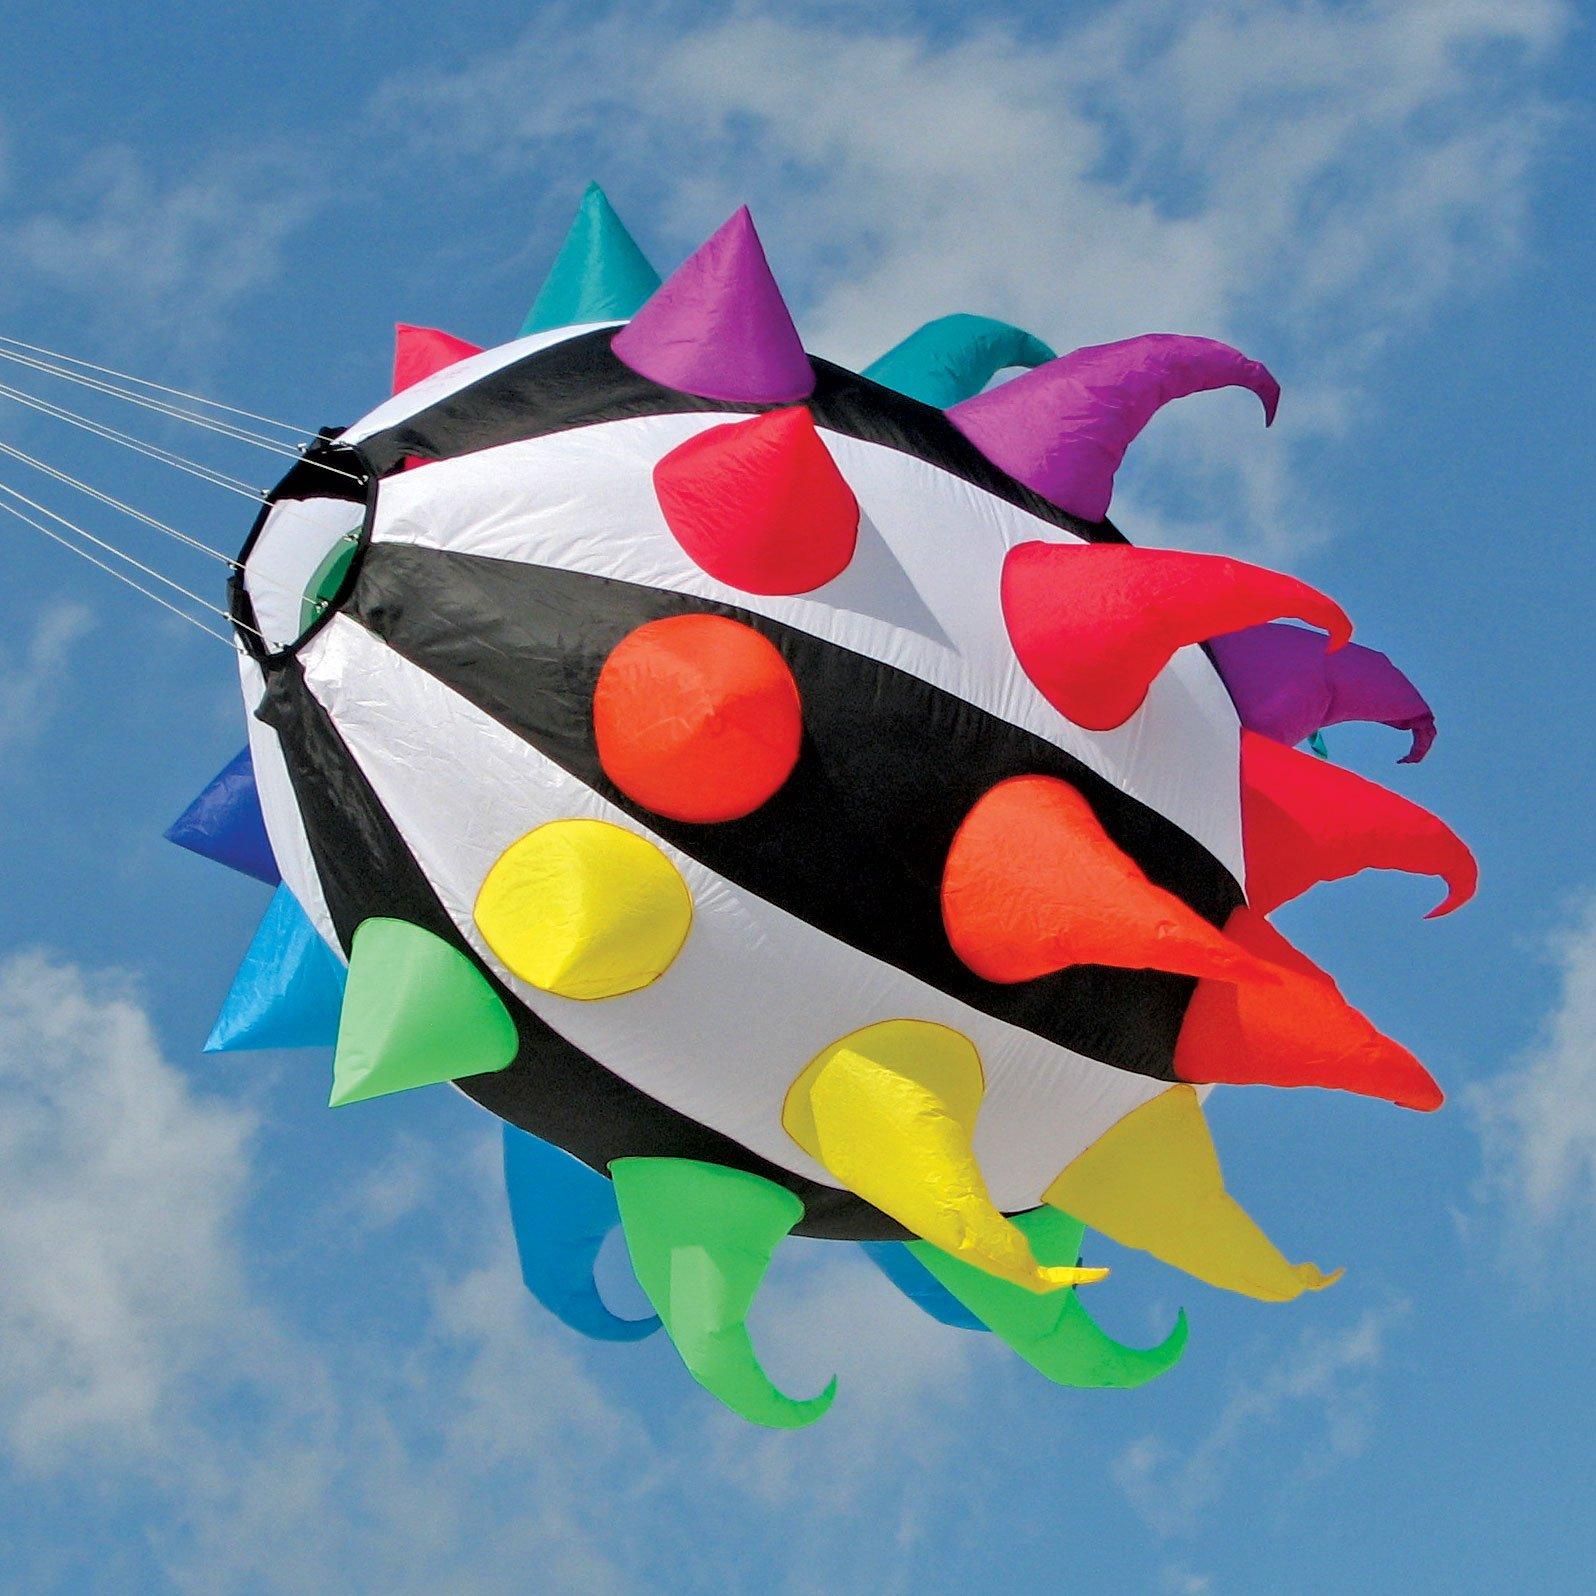 56-in Isopod Kite Line Laundry